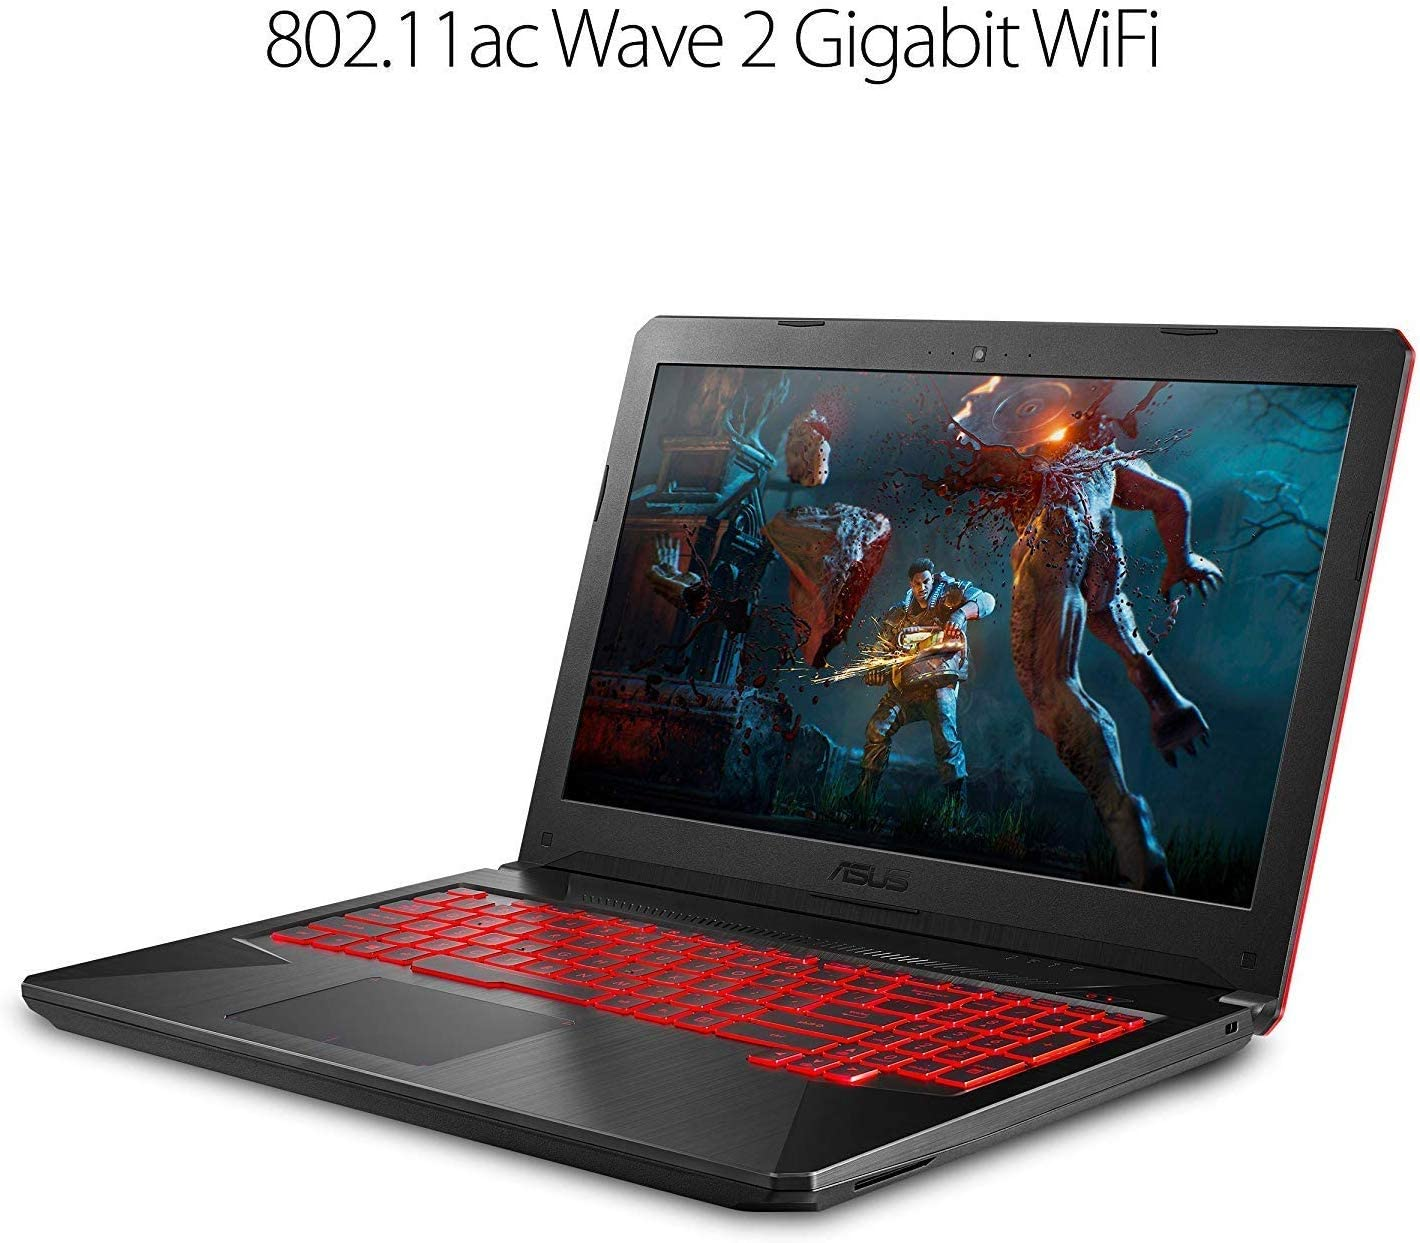 Best Gaming laptop under 1000 :Asus FX504 TUF